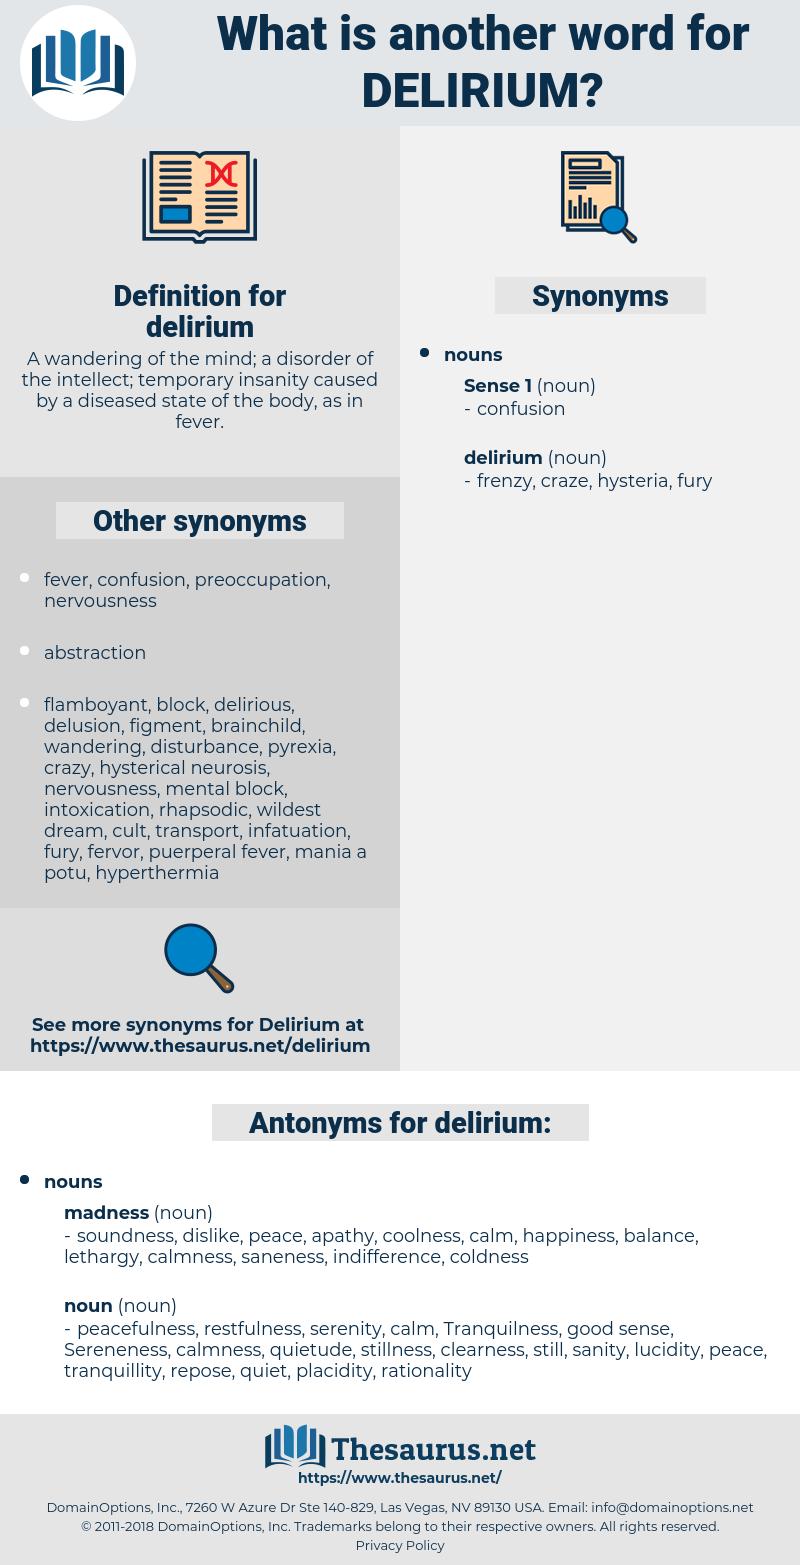 delirium, synonym delirium, another word for delirium, words like delirium, thesaurus delirium